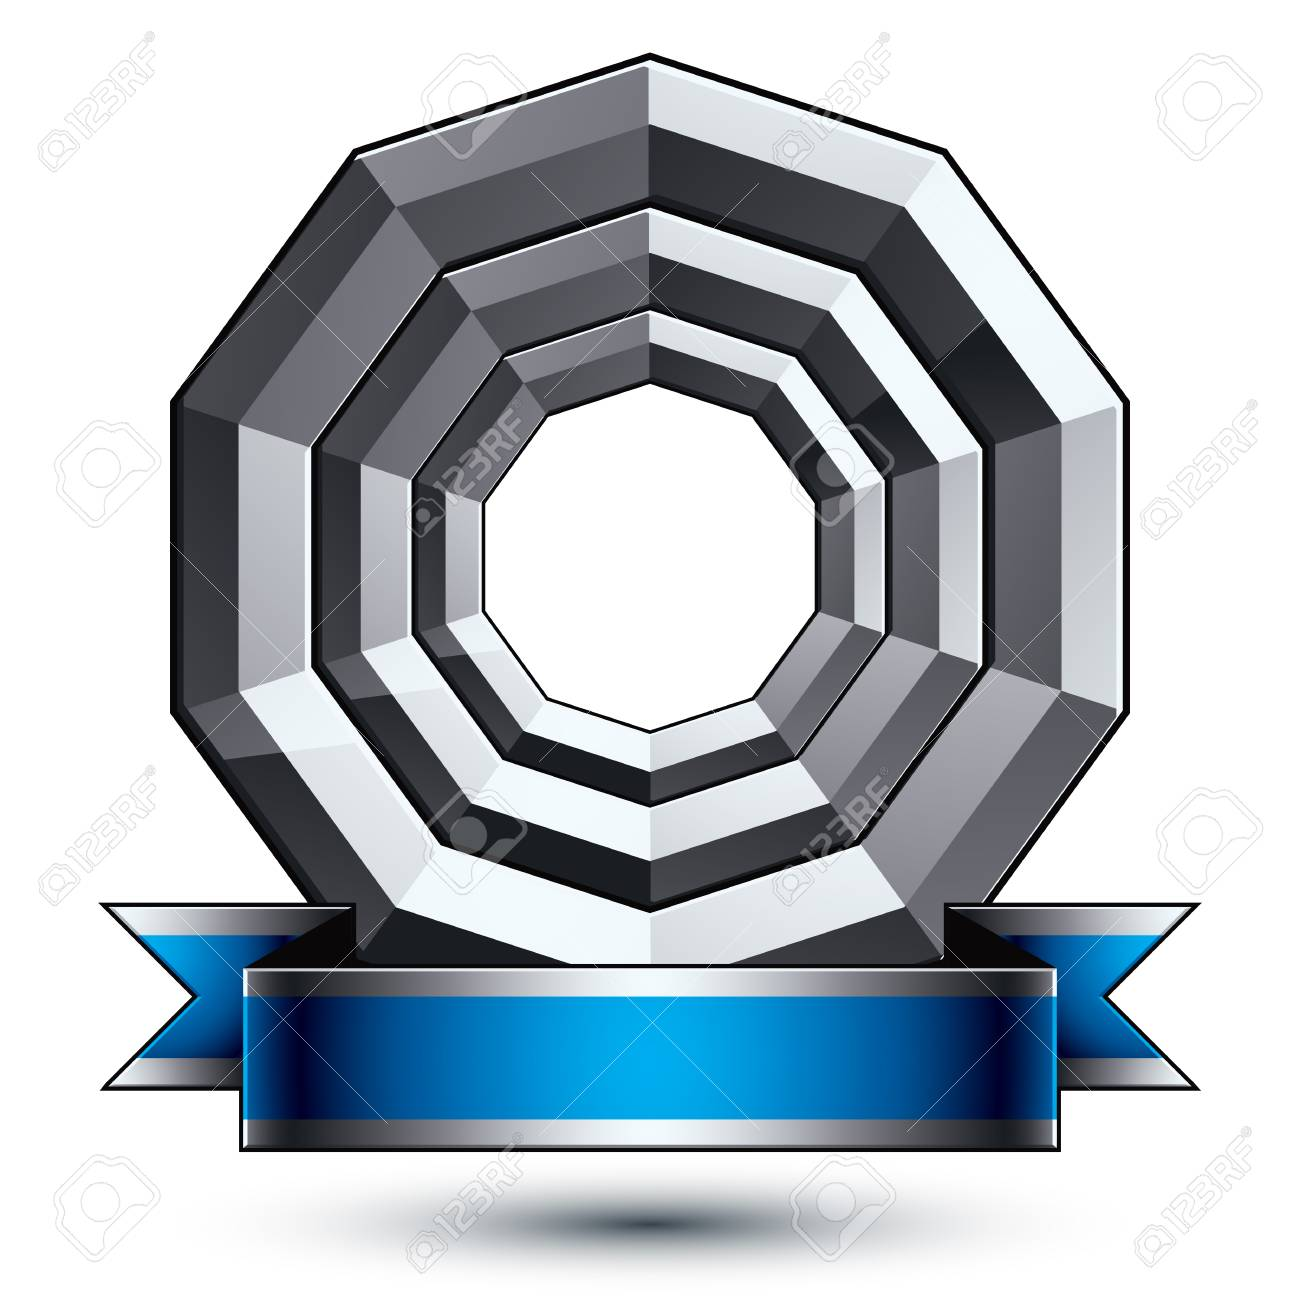 Silver Heraldic Vector Round Template, Dimensional Royal Geometric ...